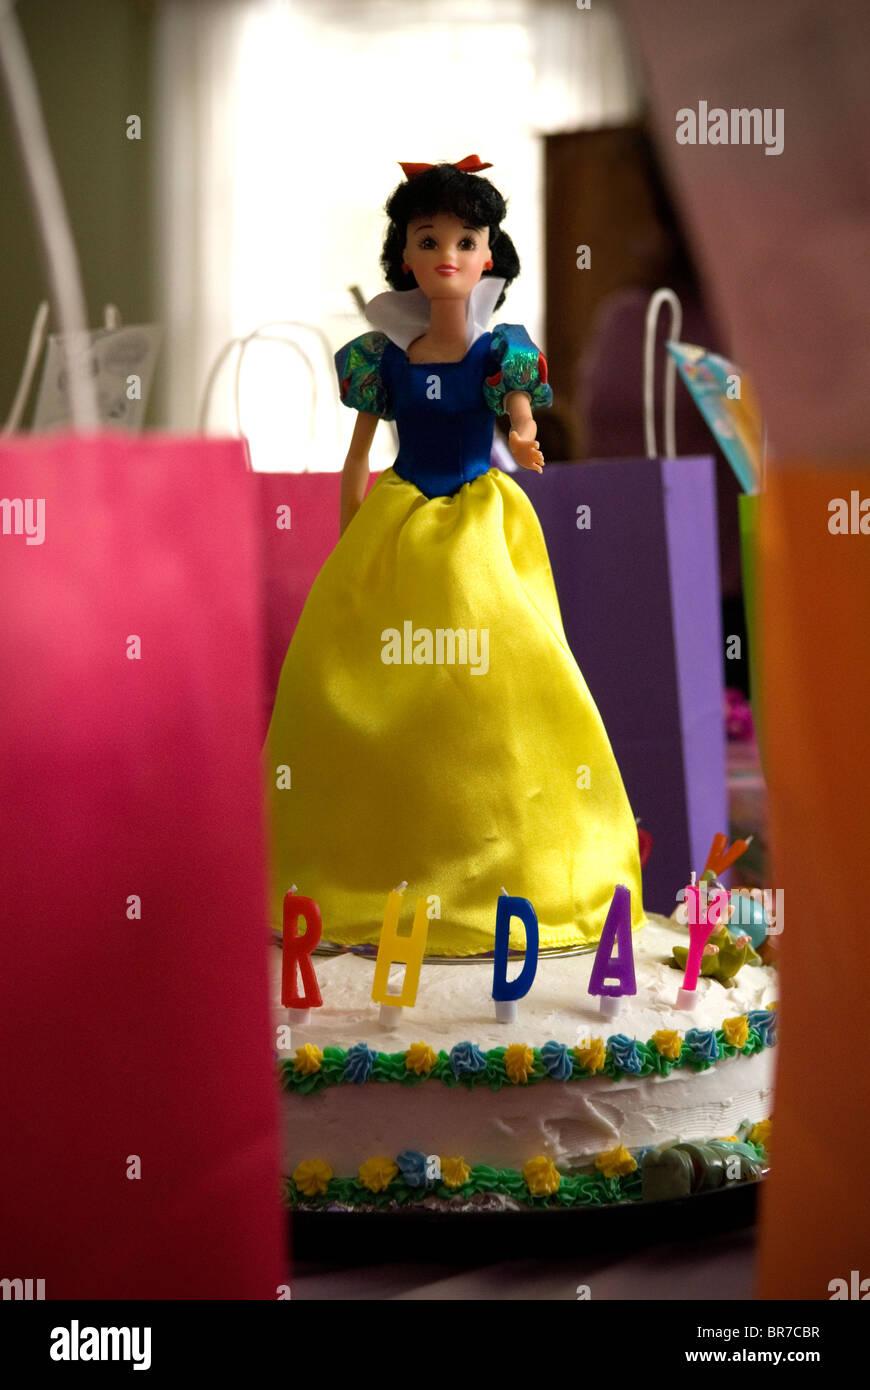 Amazing Birthday Cake Decorated With Snow White Doll Stock Photo 31510859 Funny Birthday Cards Online Alyptdamsfinfo